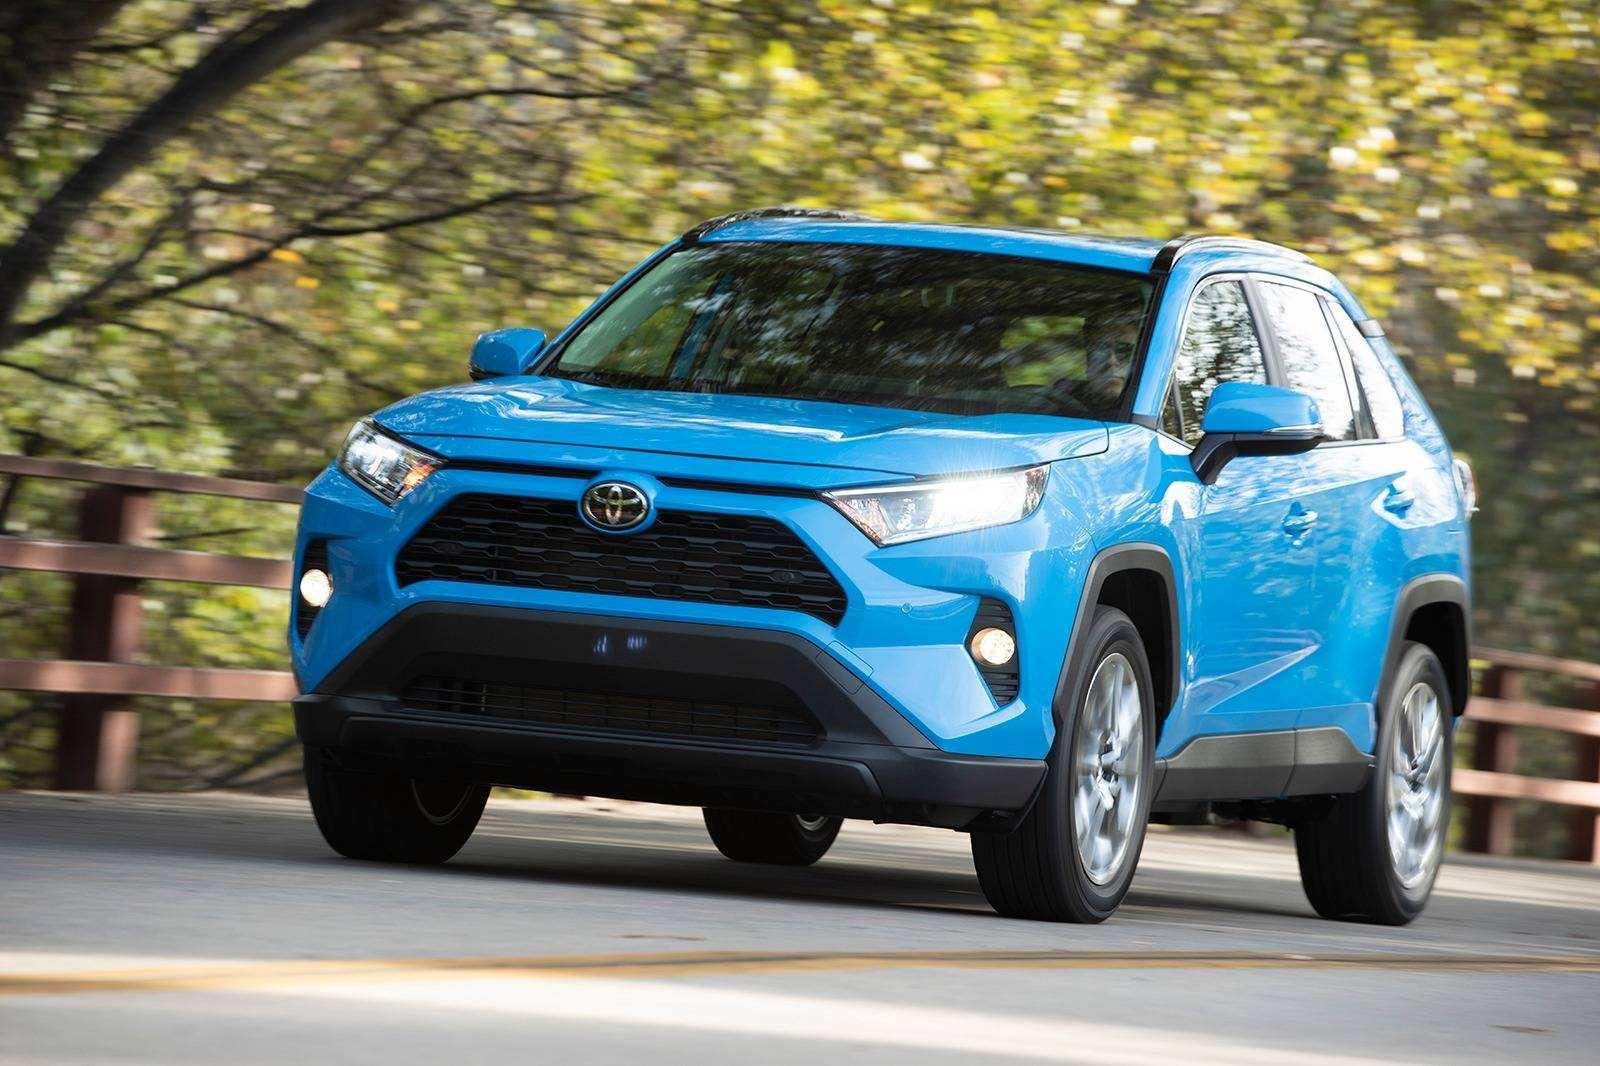 15 Great 2019 Toyota Rav4 Price for 2019 Toyota Rav4